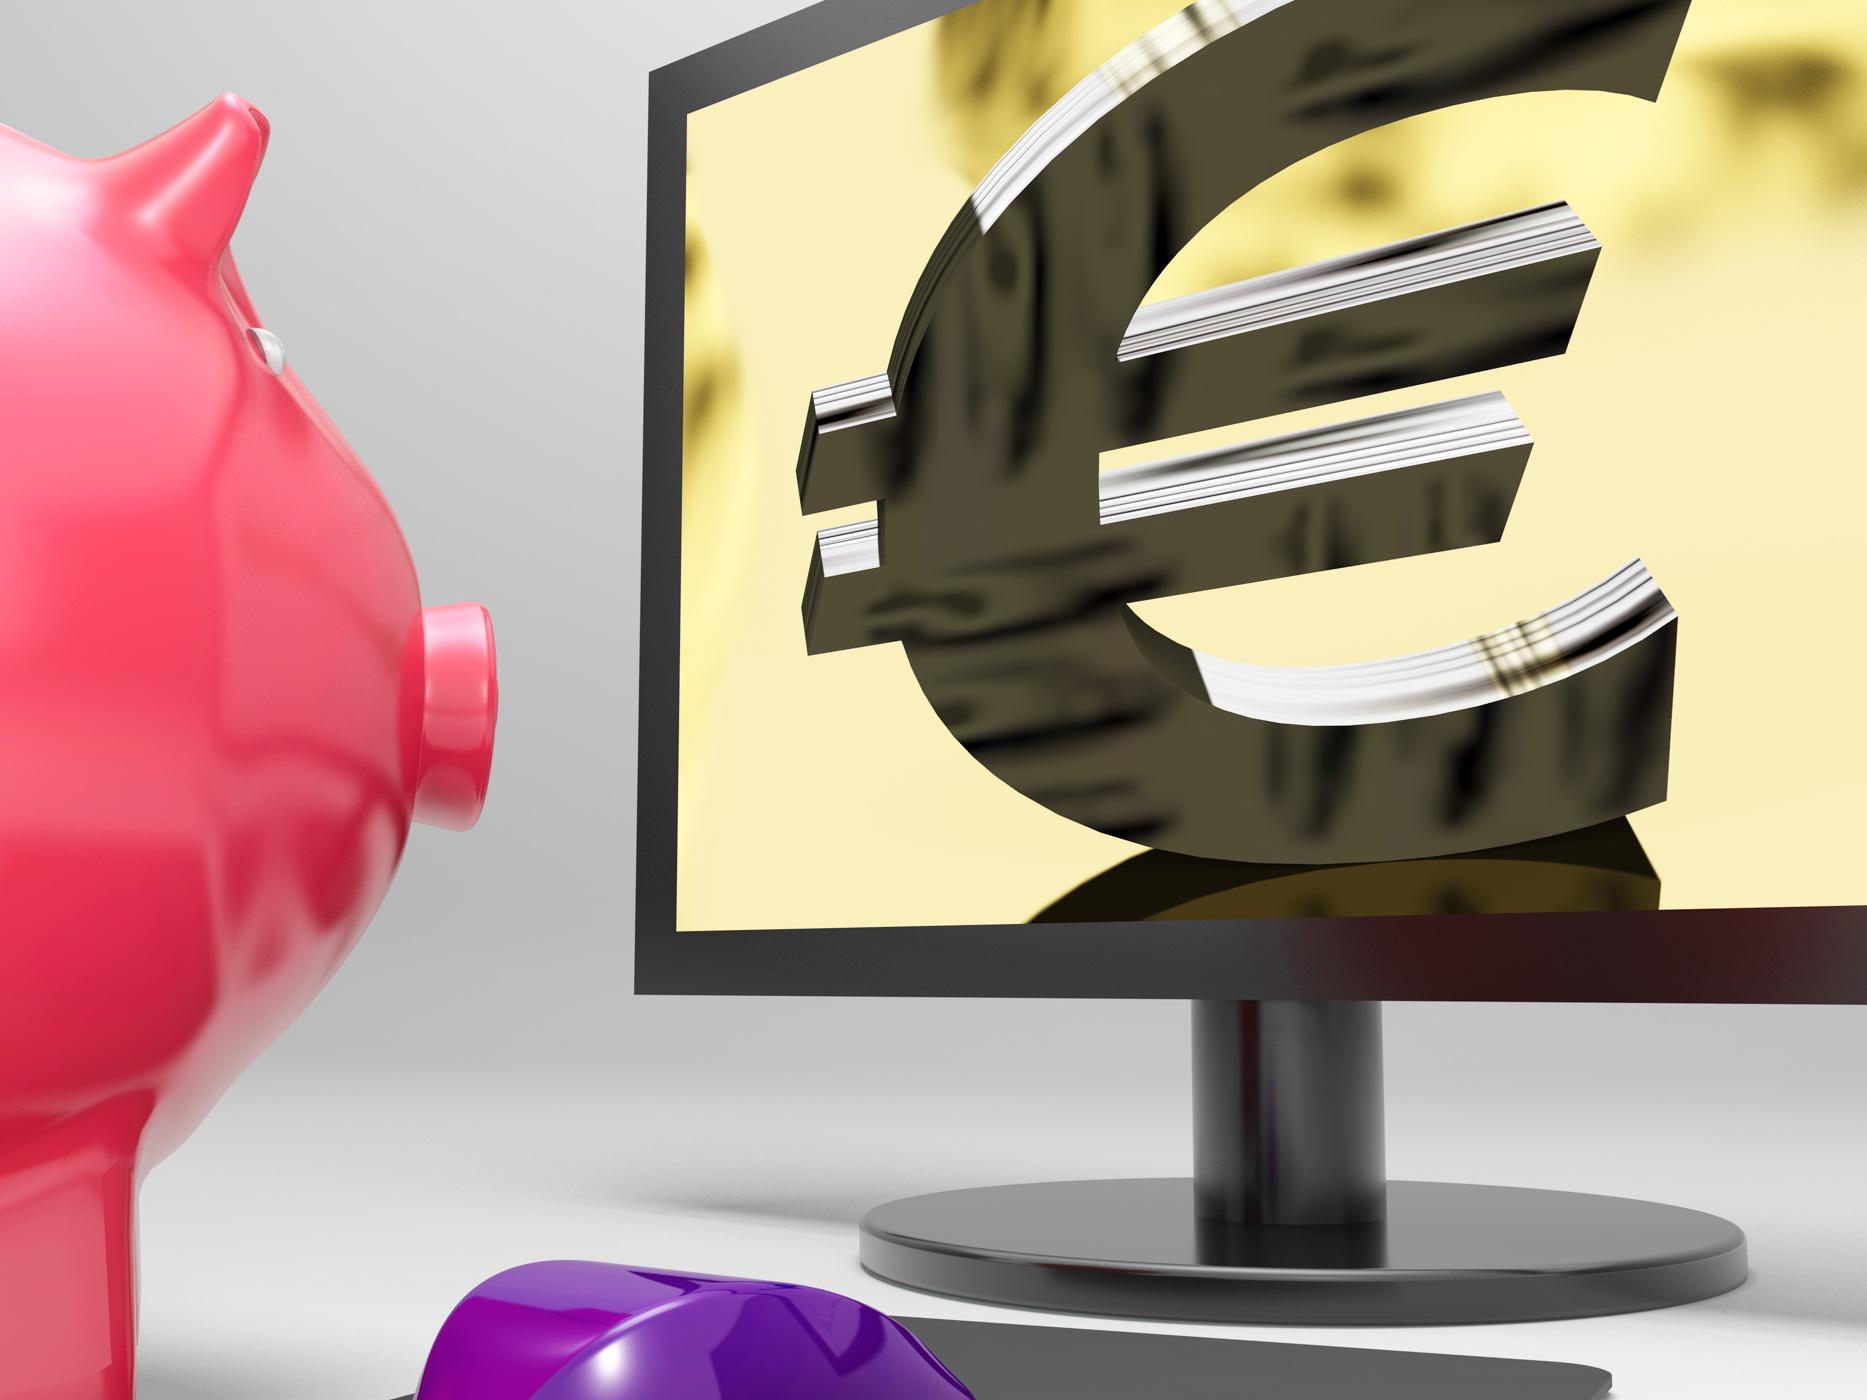 Euro Screen Shows Finance Wealth And Prosperity, Financing, Savings, Prosperity, Money, HQ Photo